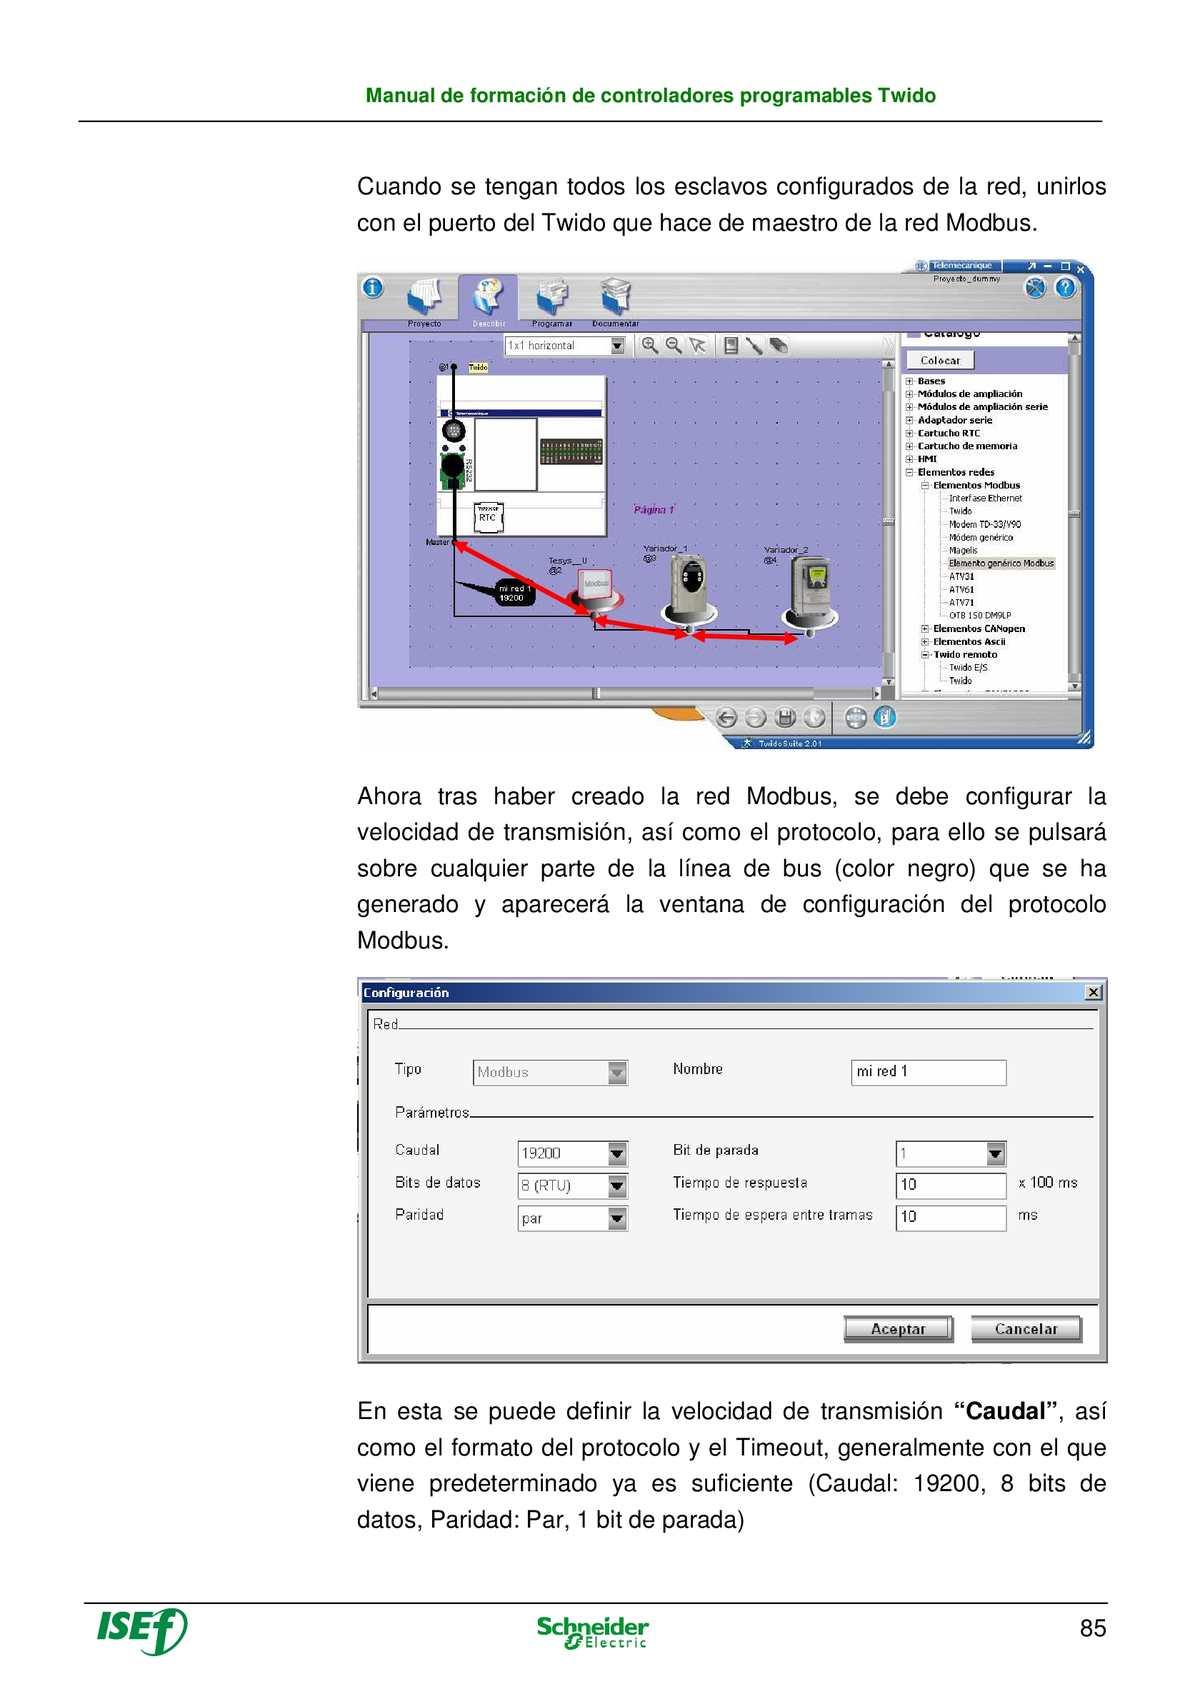 Manual PLC Twido - CALAMEO Downloader